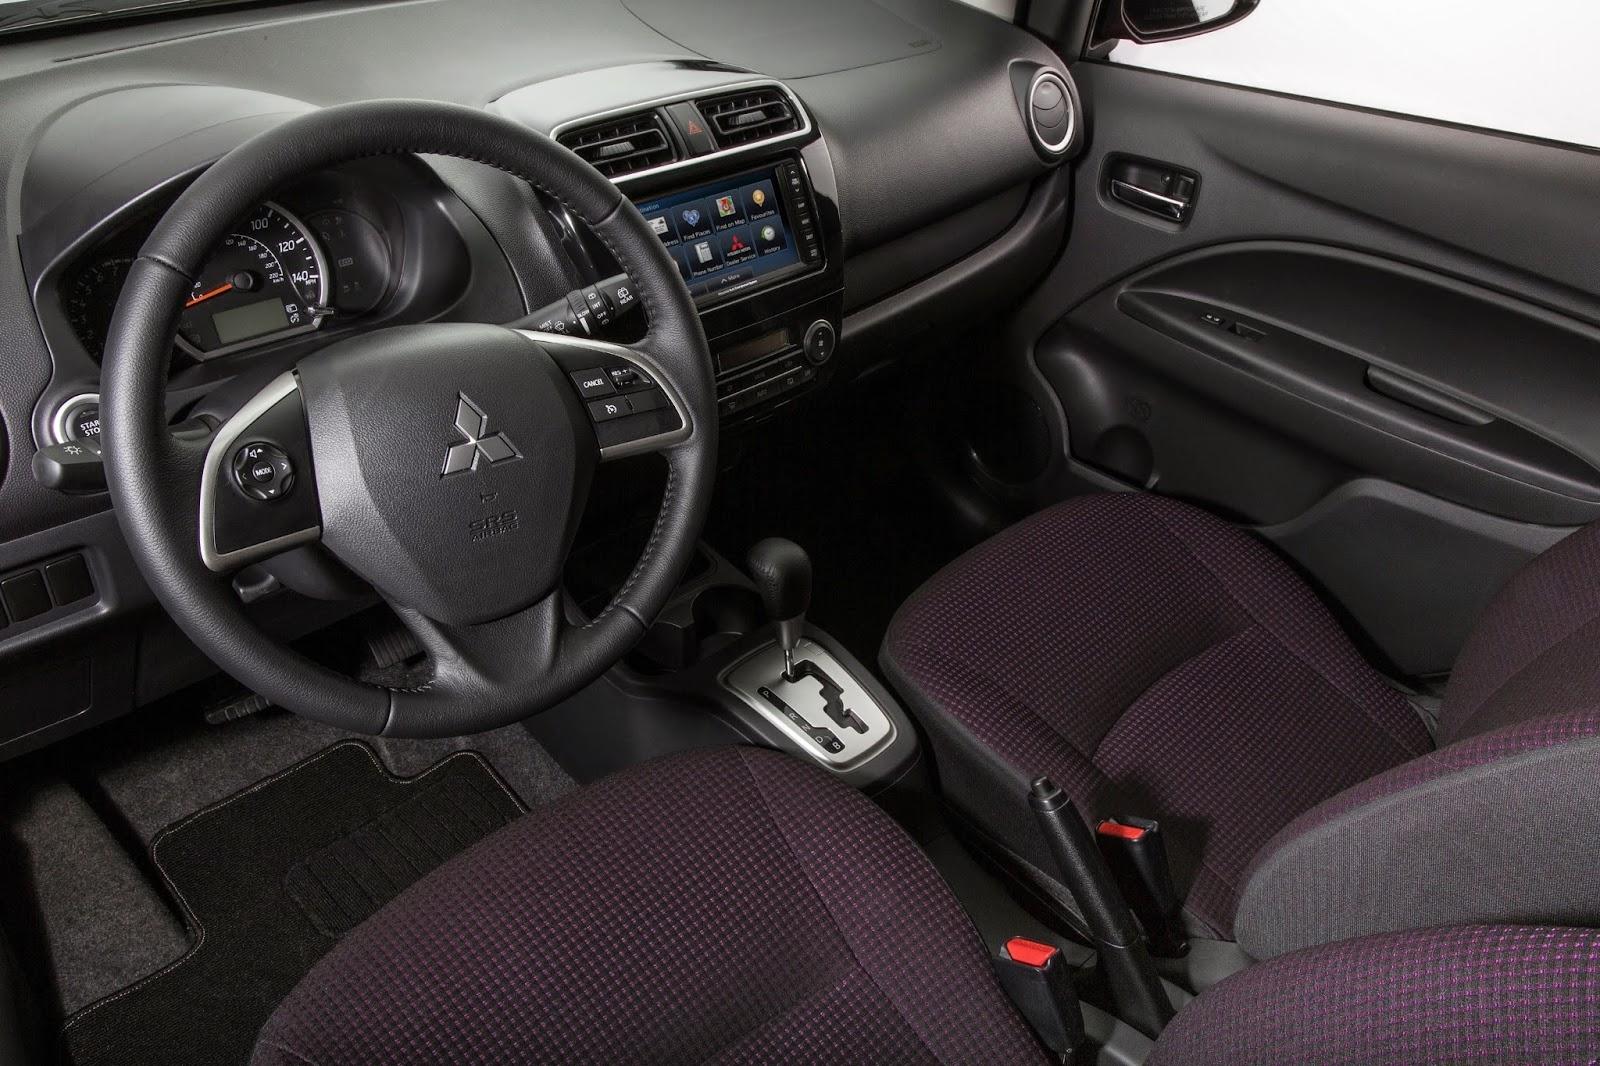 Interior view of 2014 Mitsubishi Mirage